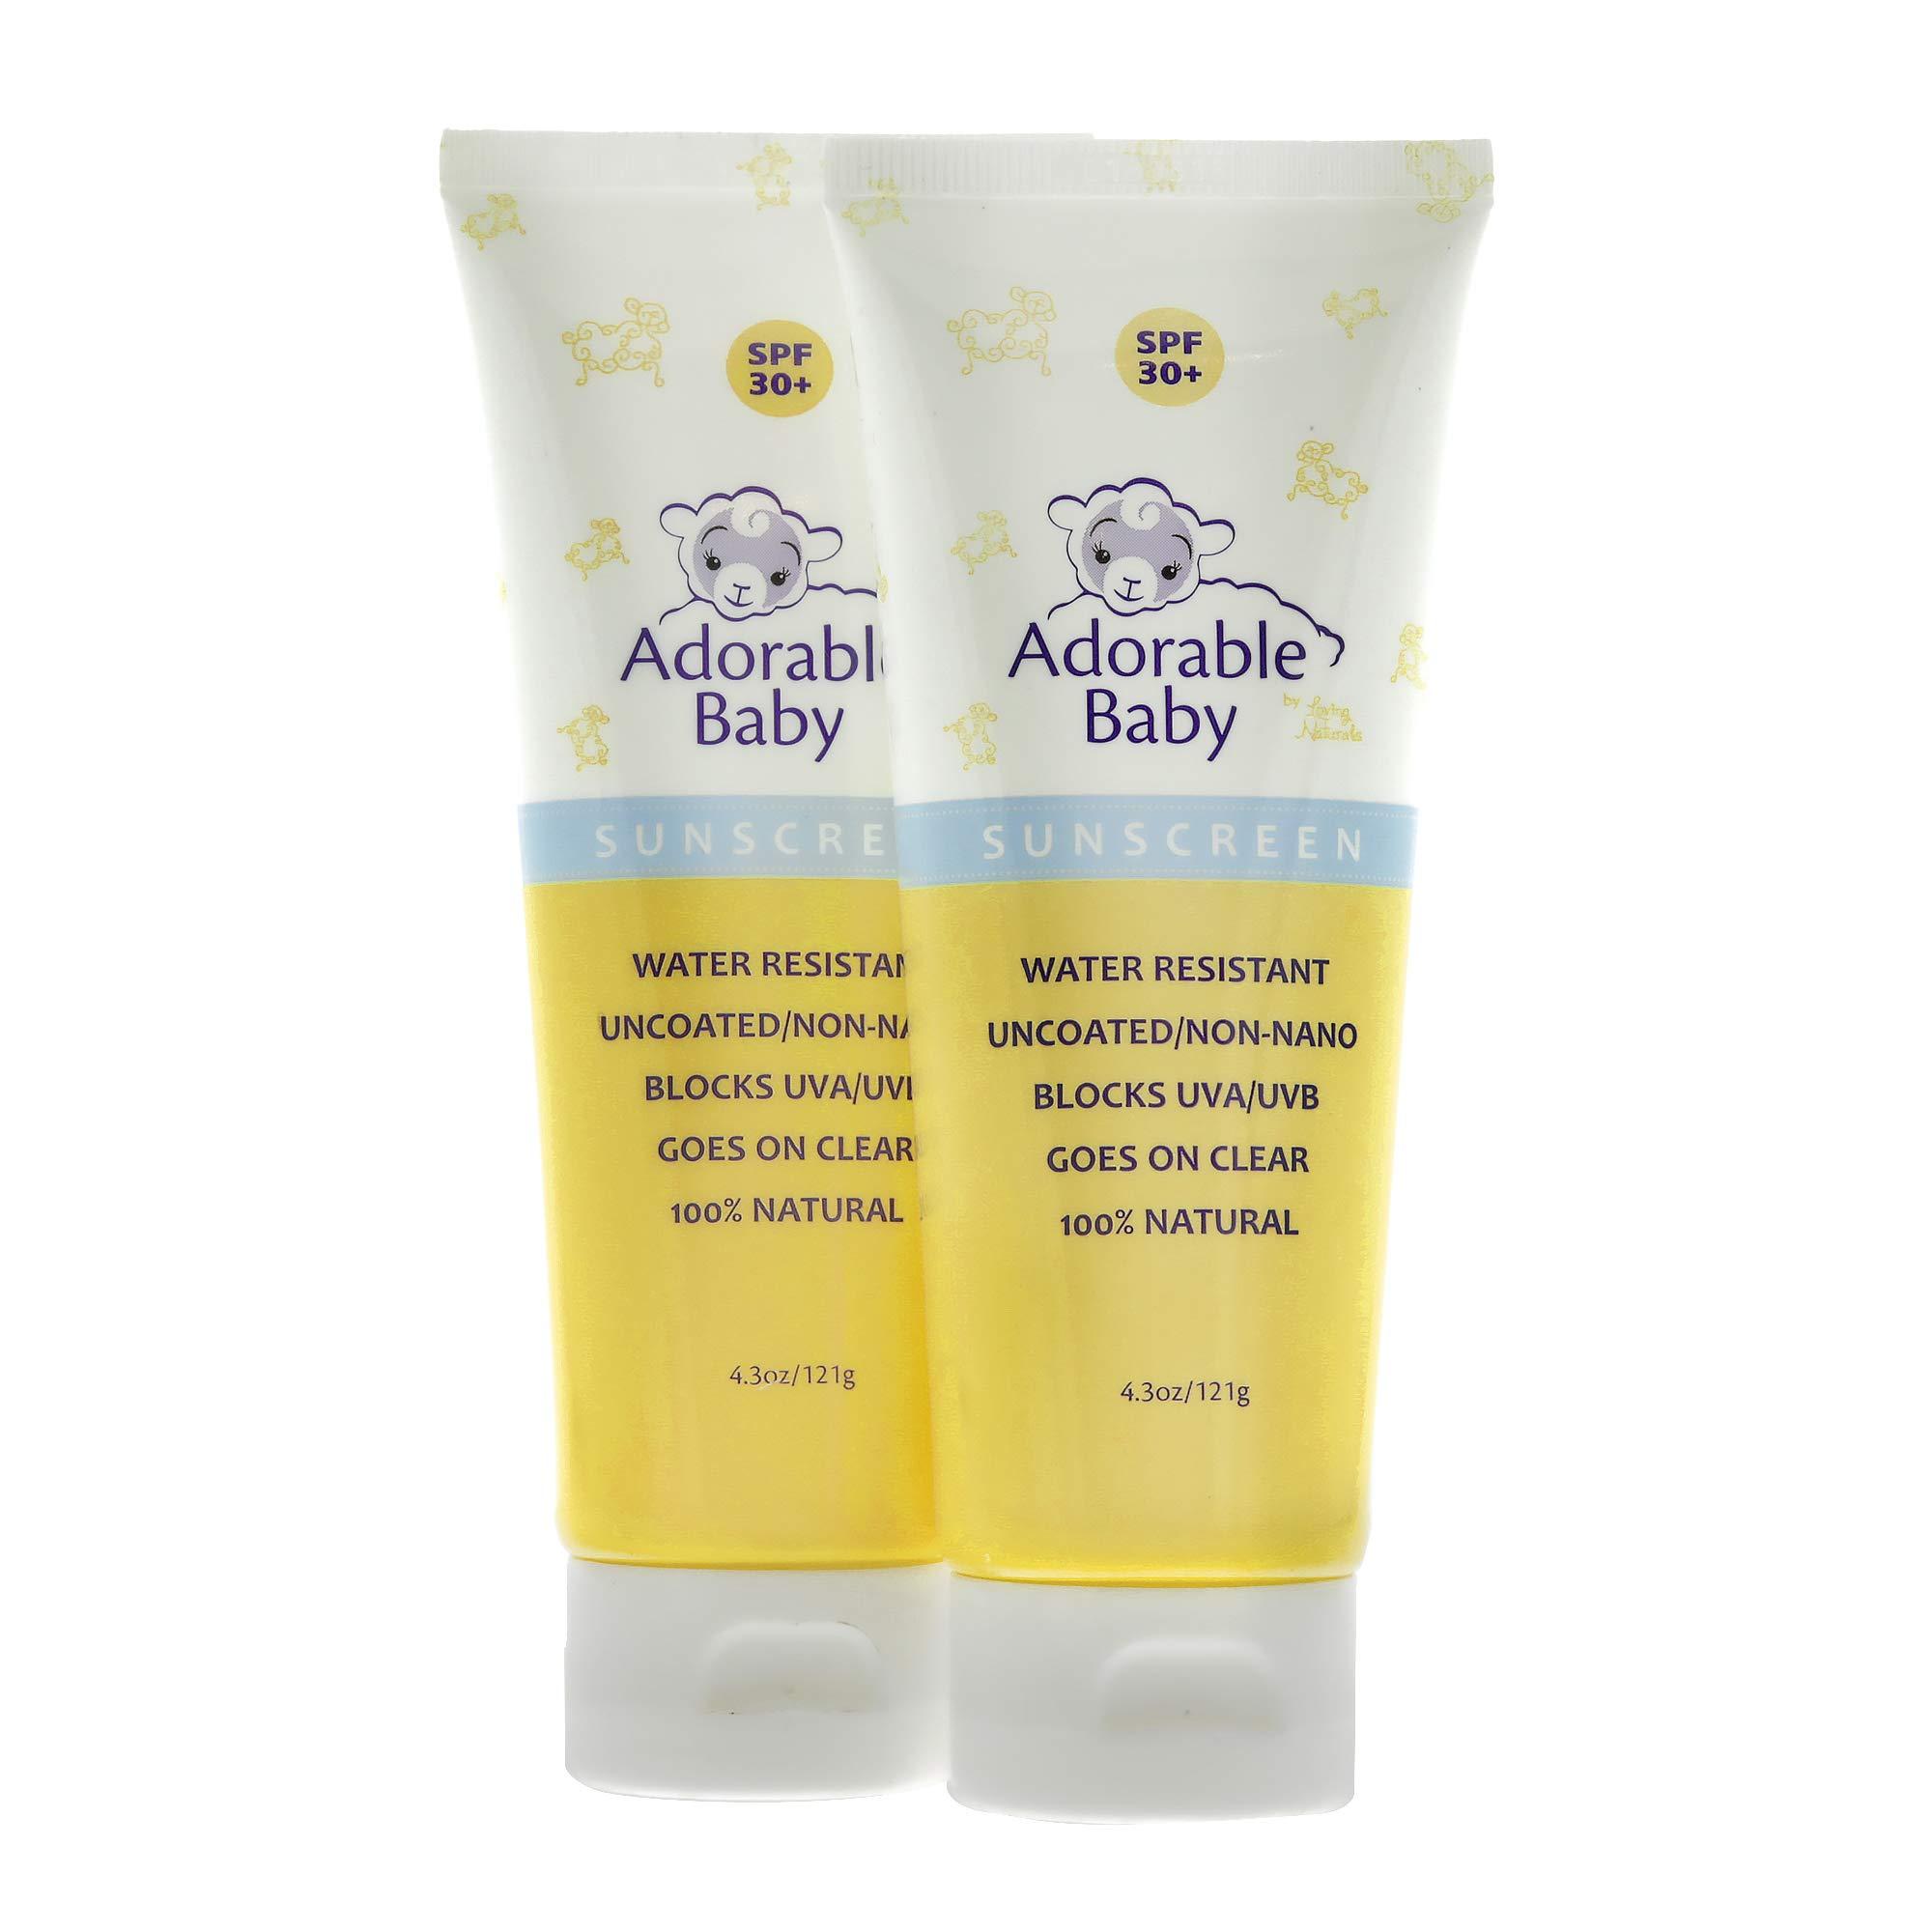 Adorable Baby All Natural Sunscreen SPF 30+ Non-Nano Zinc Oxide UVA/UVB 4.3oz By Loving Naturals (2 Pack) by Adorable Baby by Loving Naturals